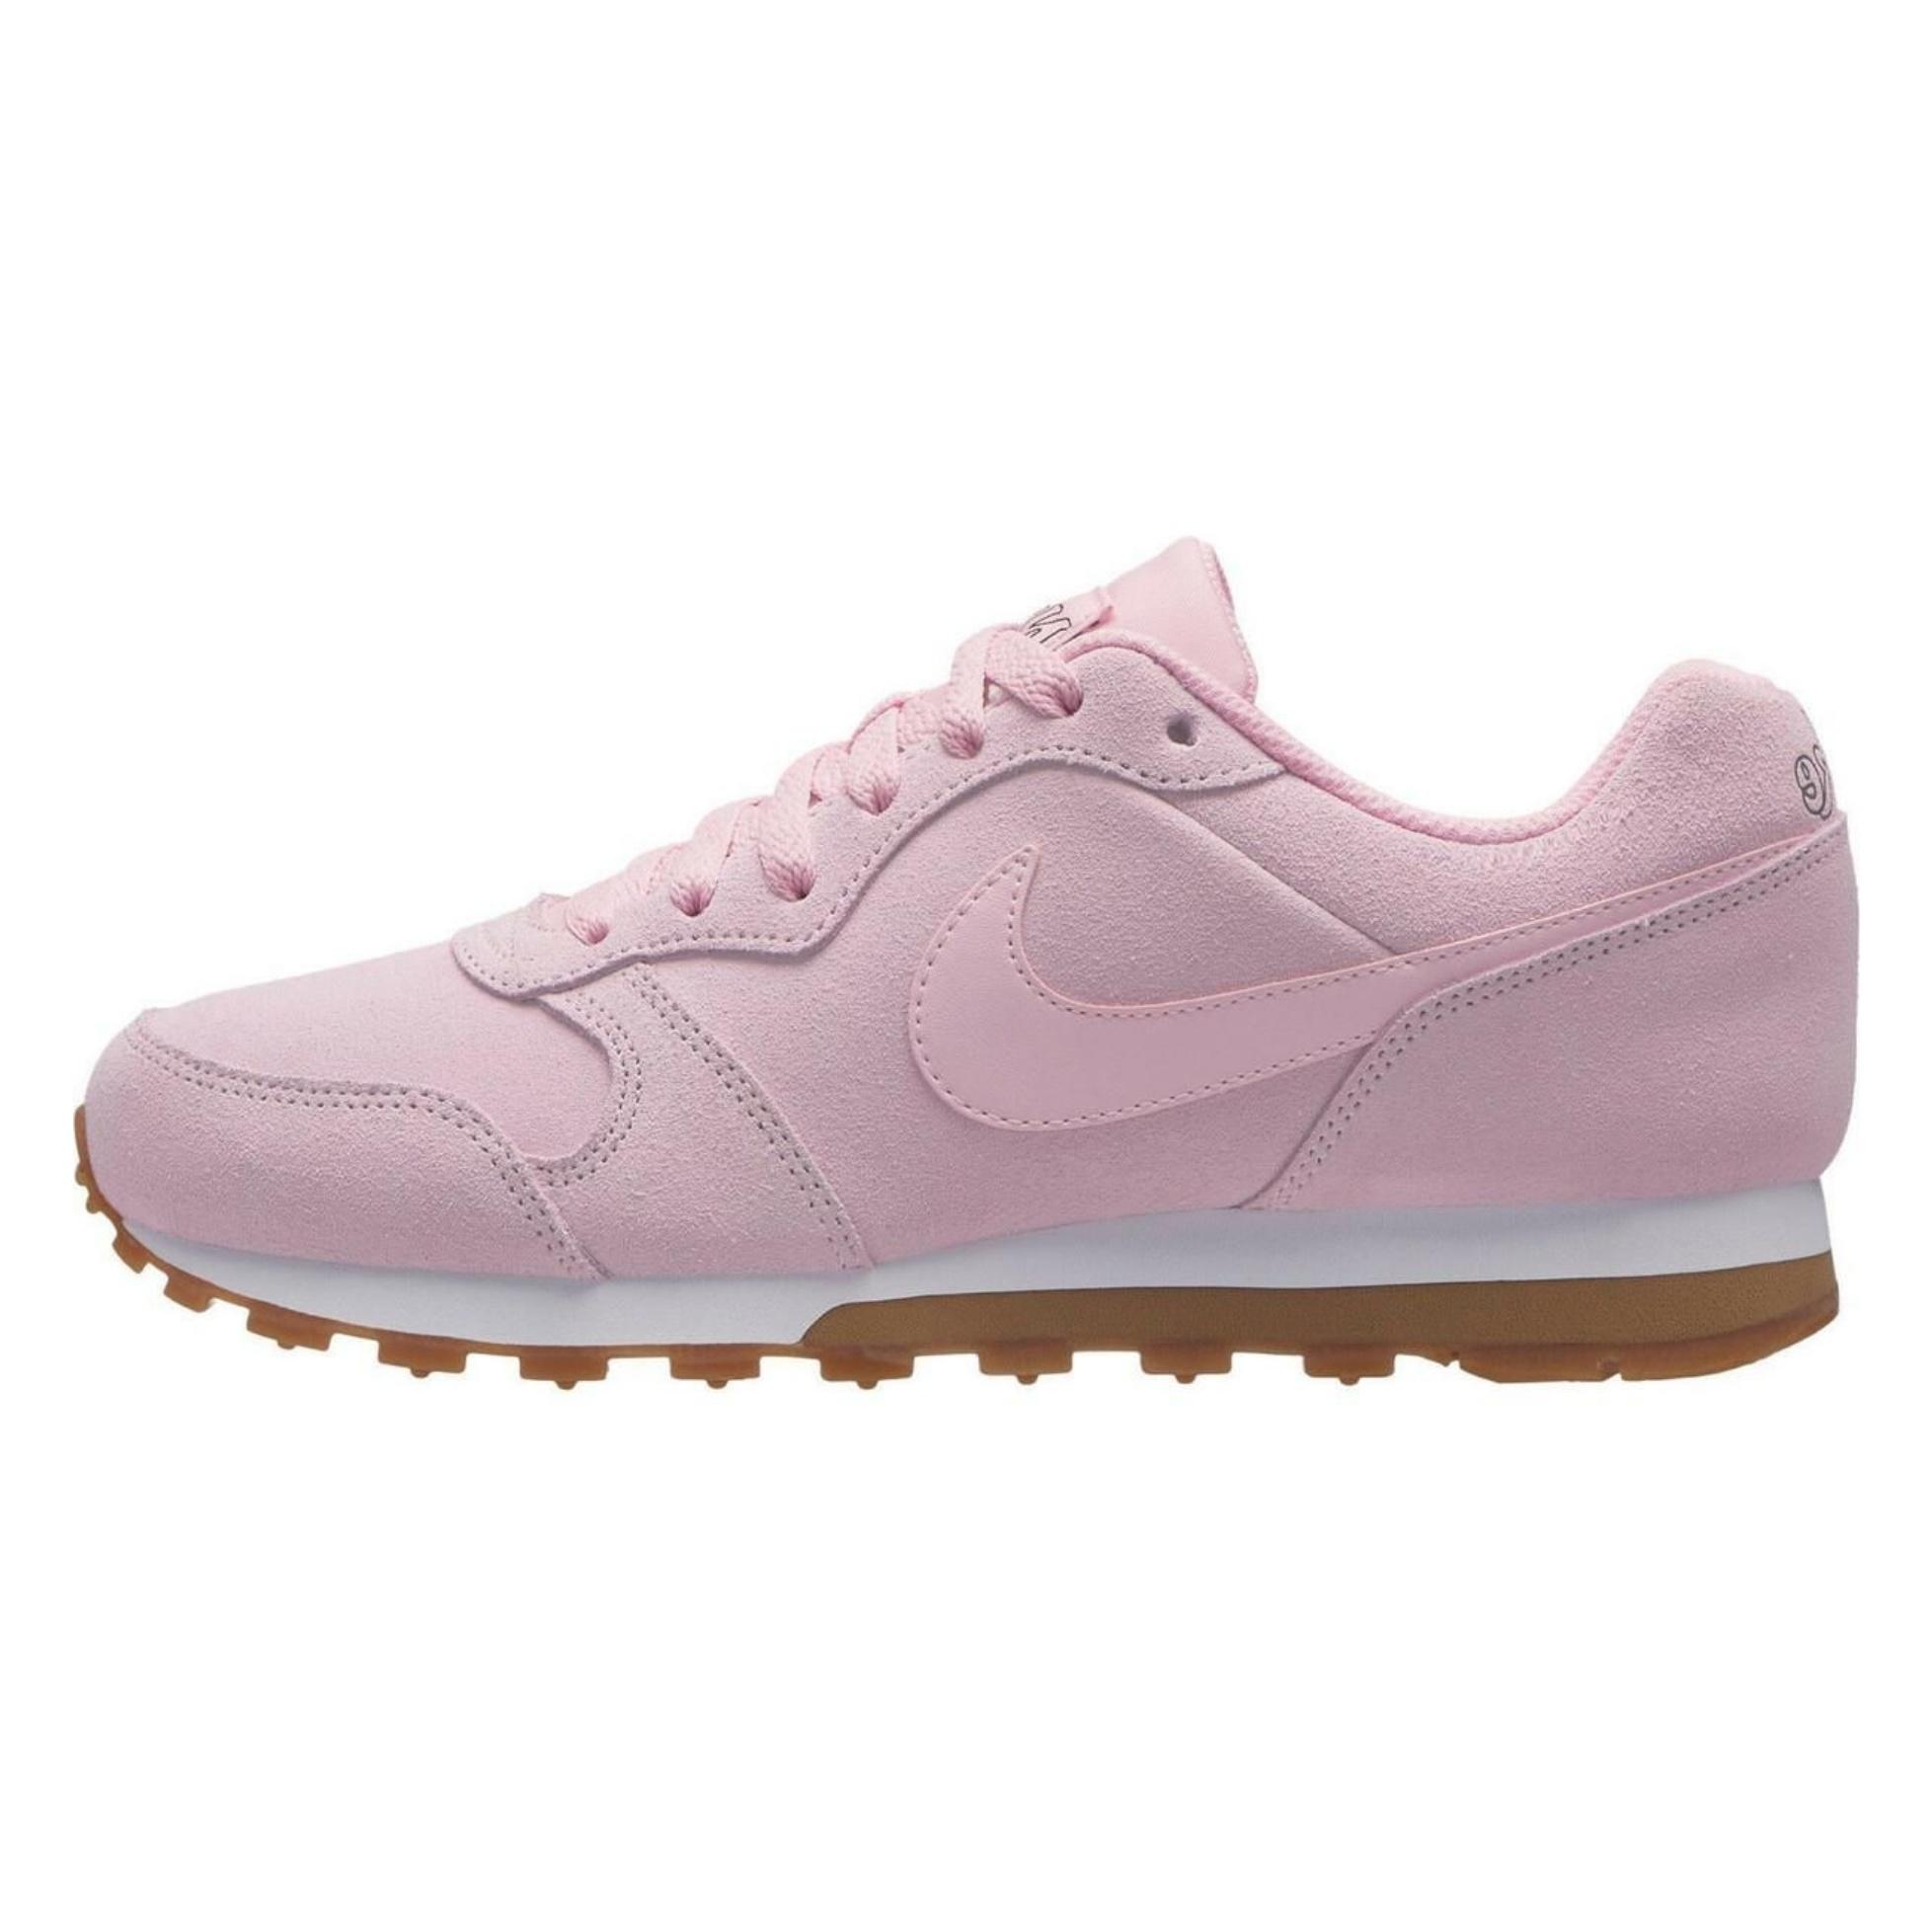 کفش راحتی زنانه نایکی مدل MD RUNNER 2